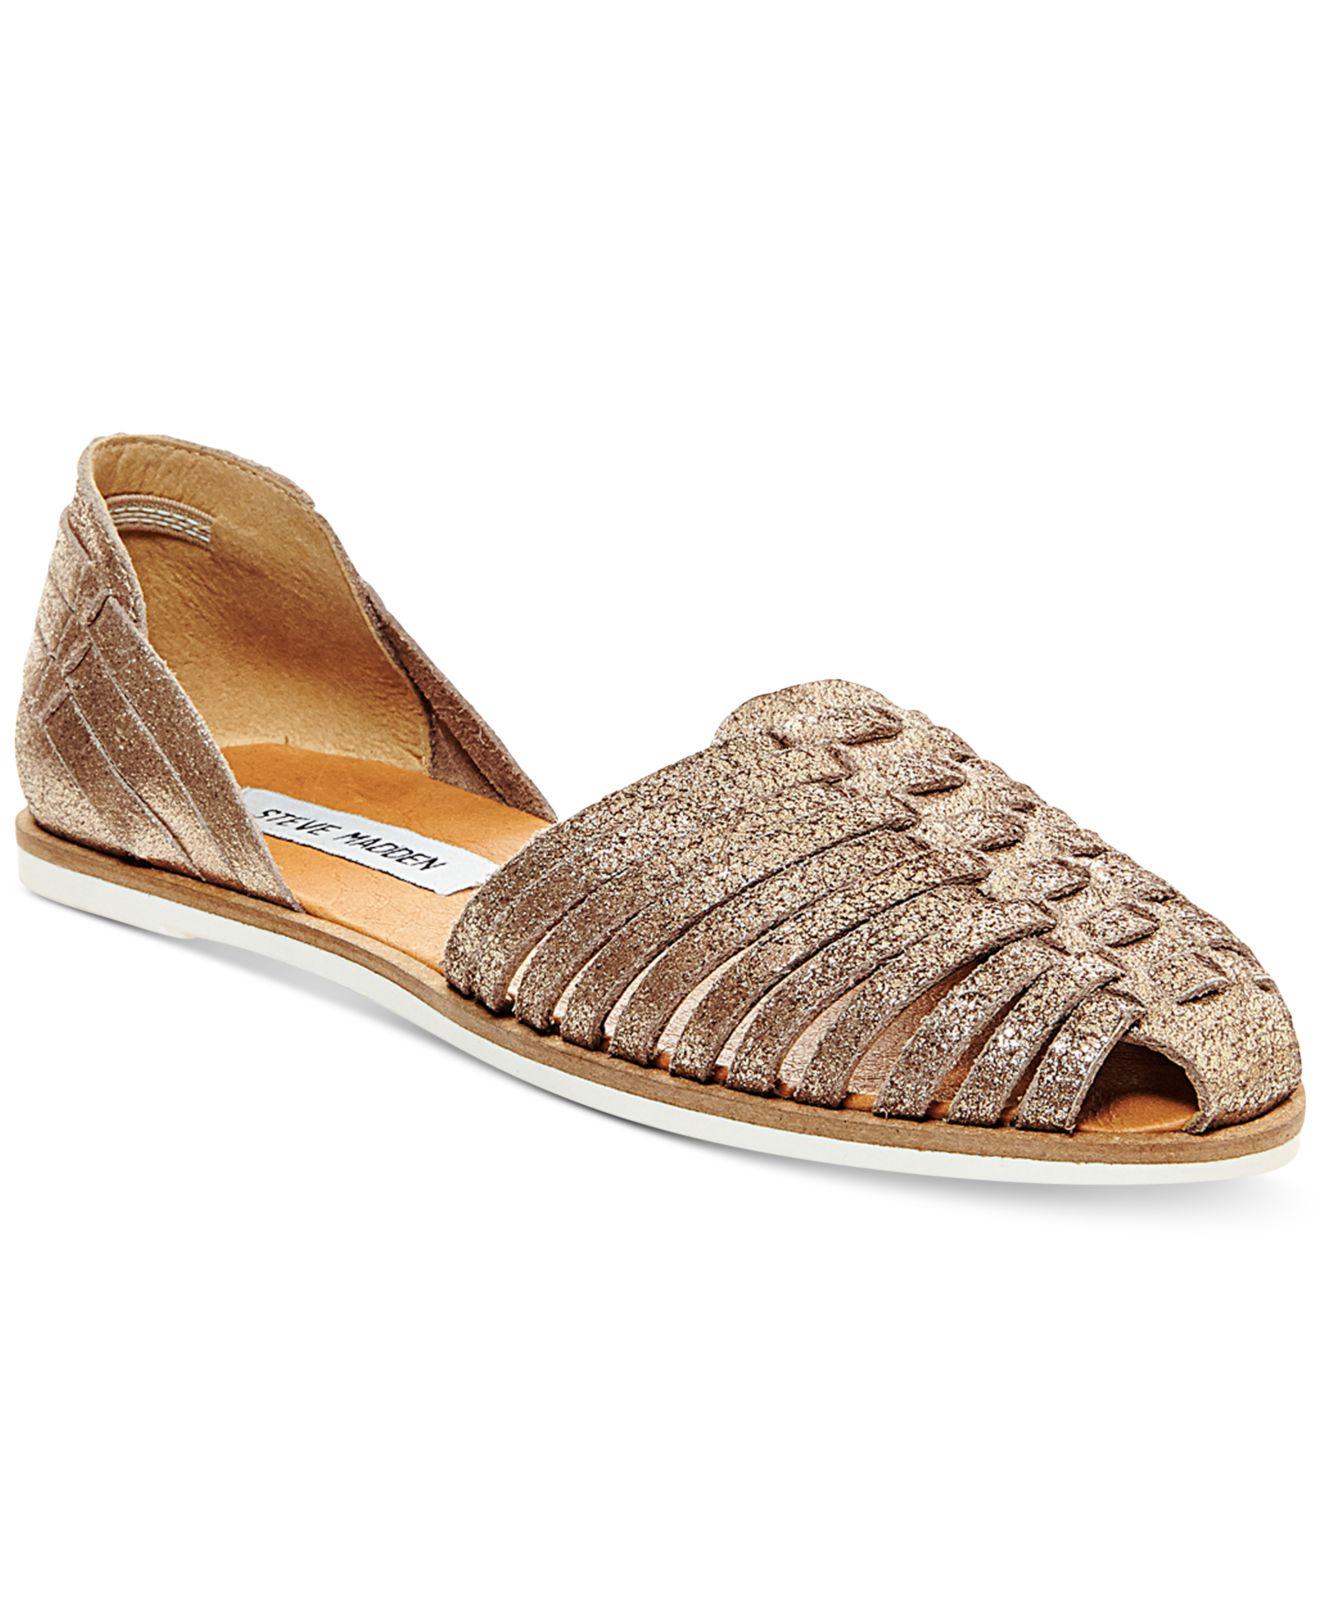 415c908a0594 Lyst - Steve Madden Women s Hillarie Huarache Slip-on Sandals in ...